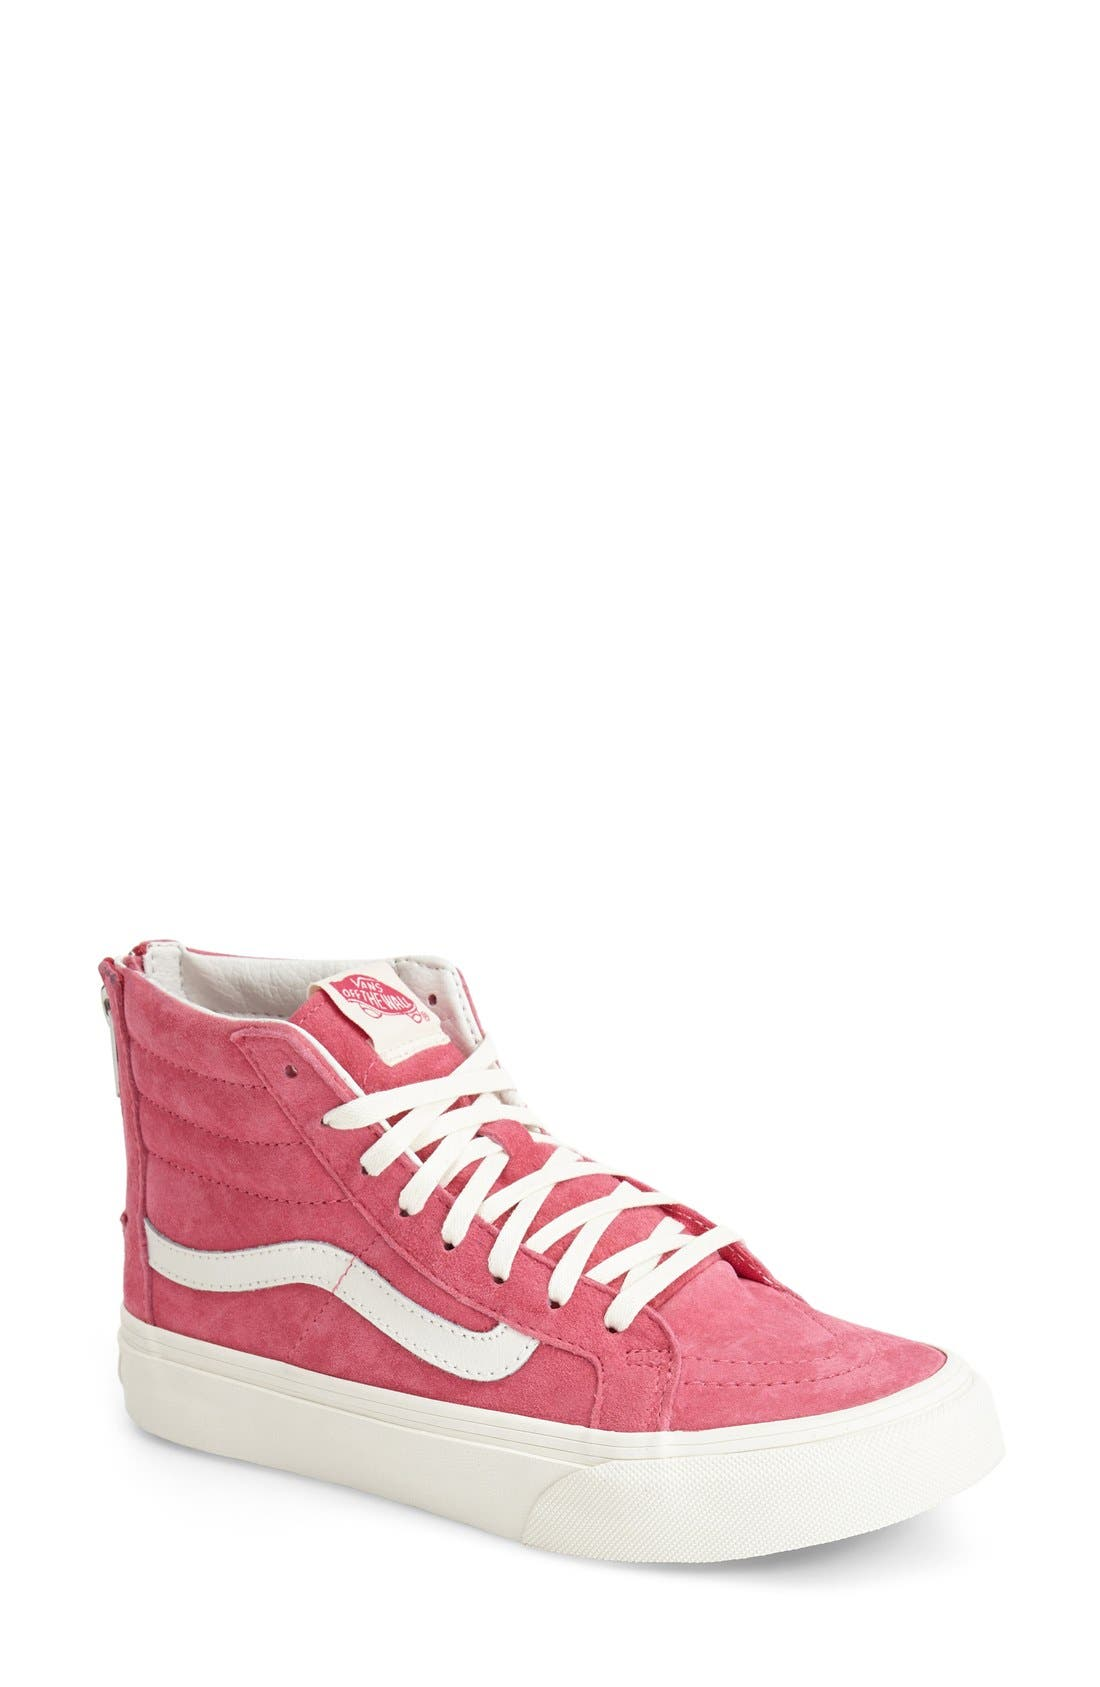 Alternate Image 1 Selected - Vans 'Sk8-Hi Slim Zip' Sneaker (Women)